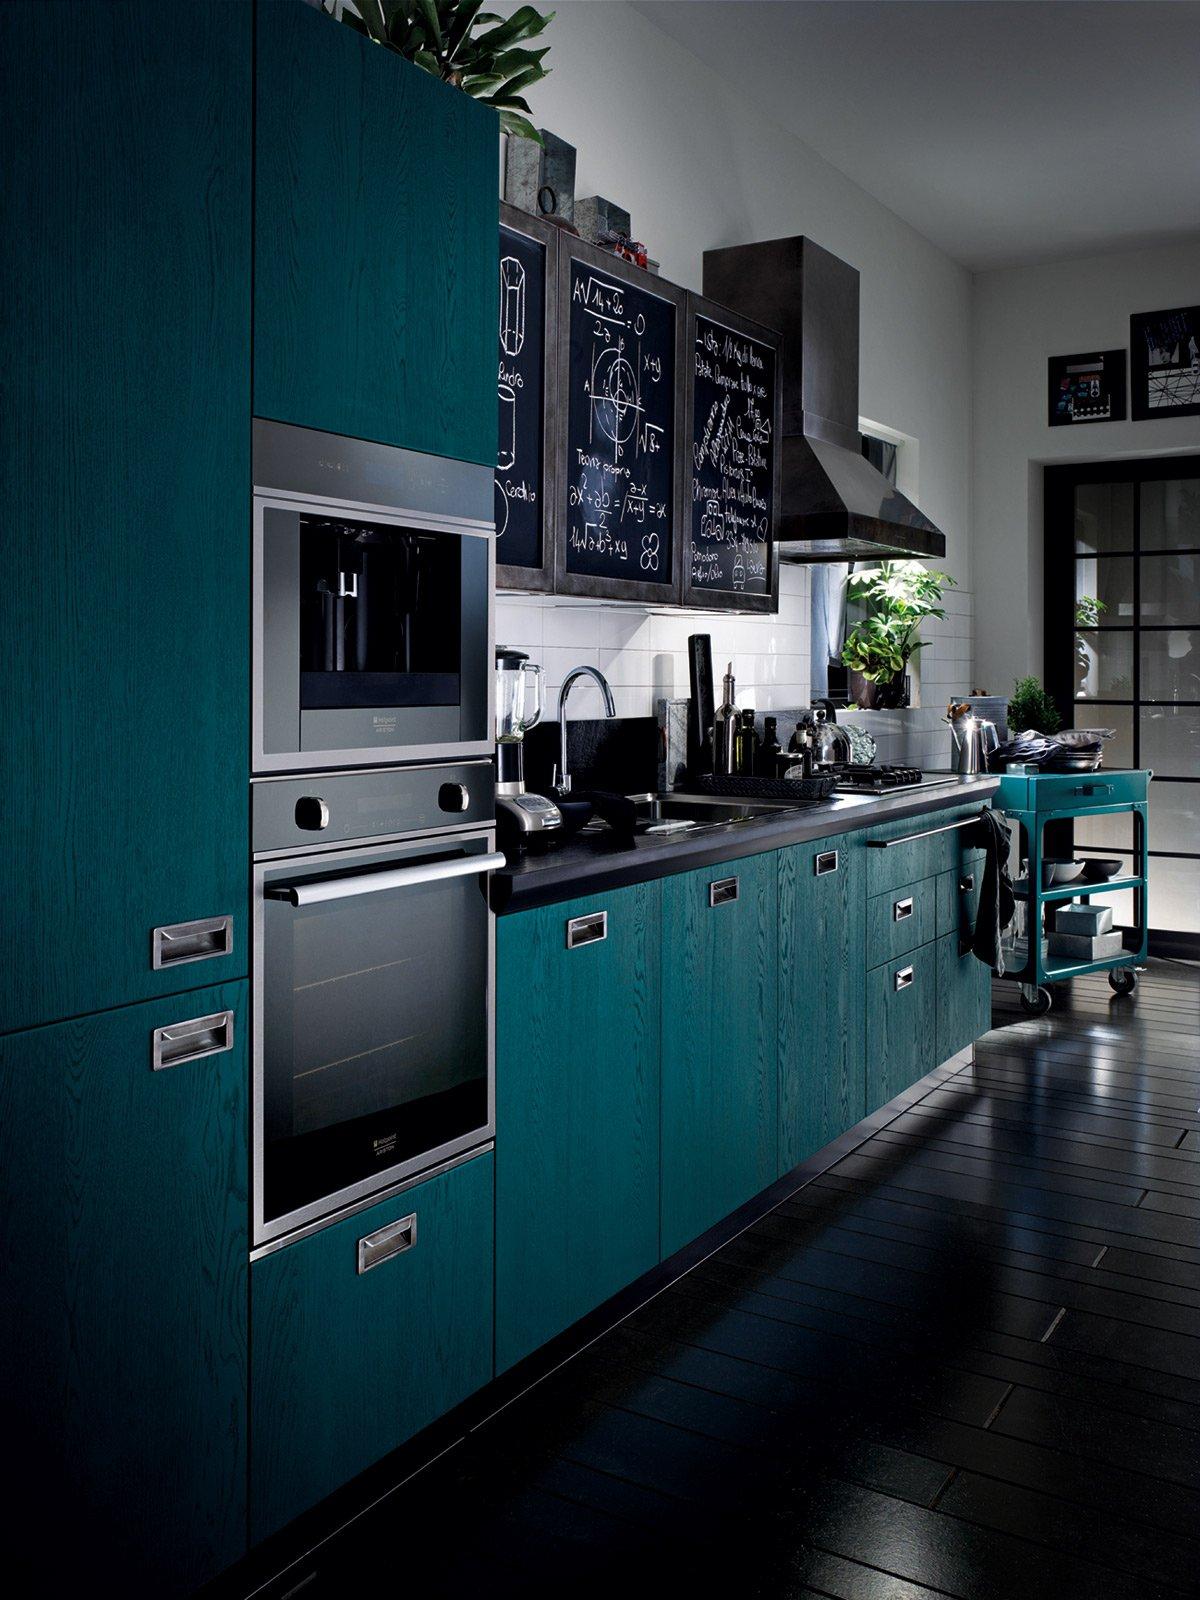 Emejing Cucine Stosa Opinioni Pictures - Acomo.us - acomo.us